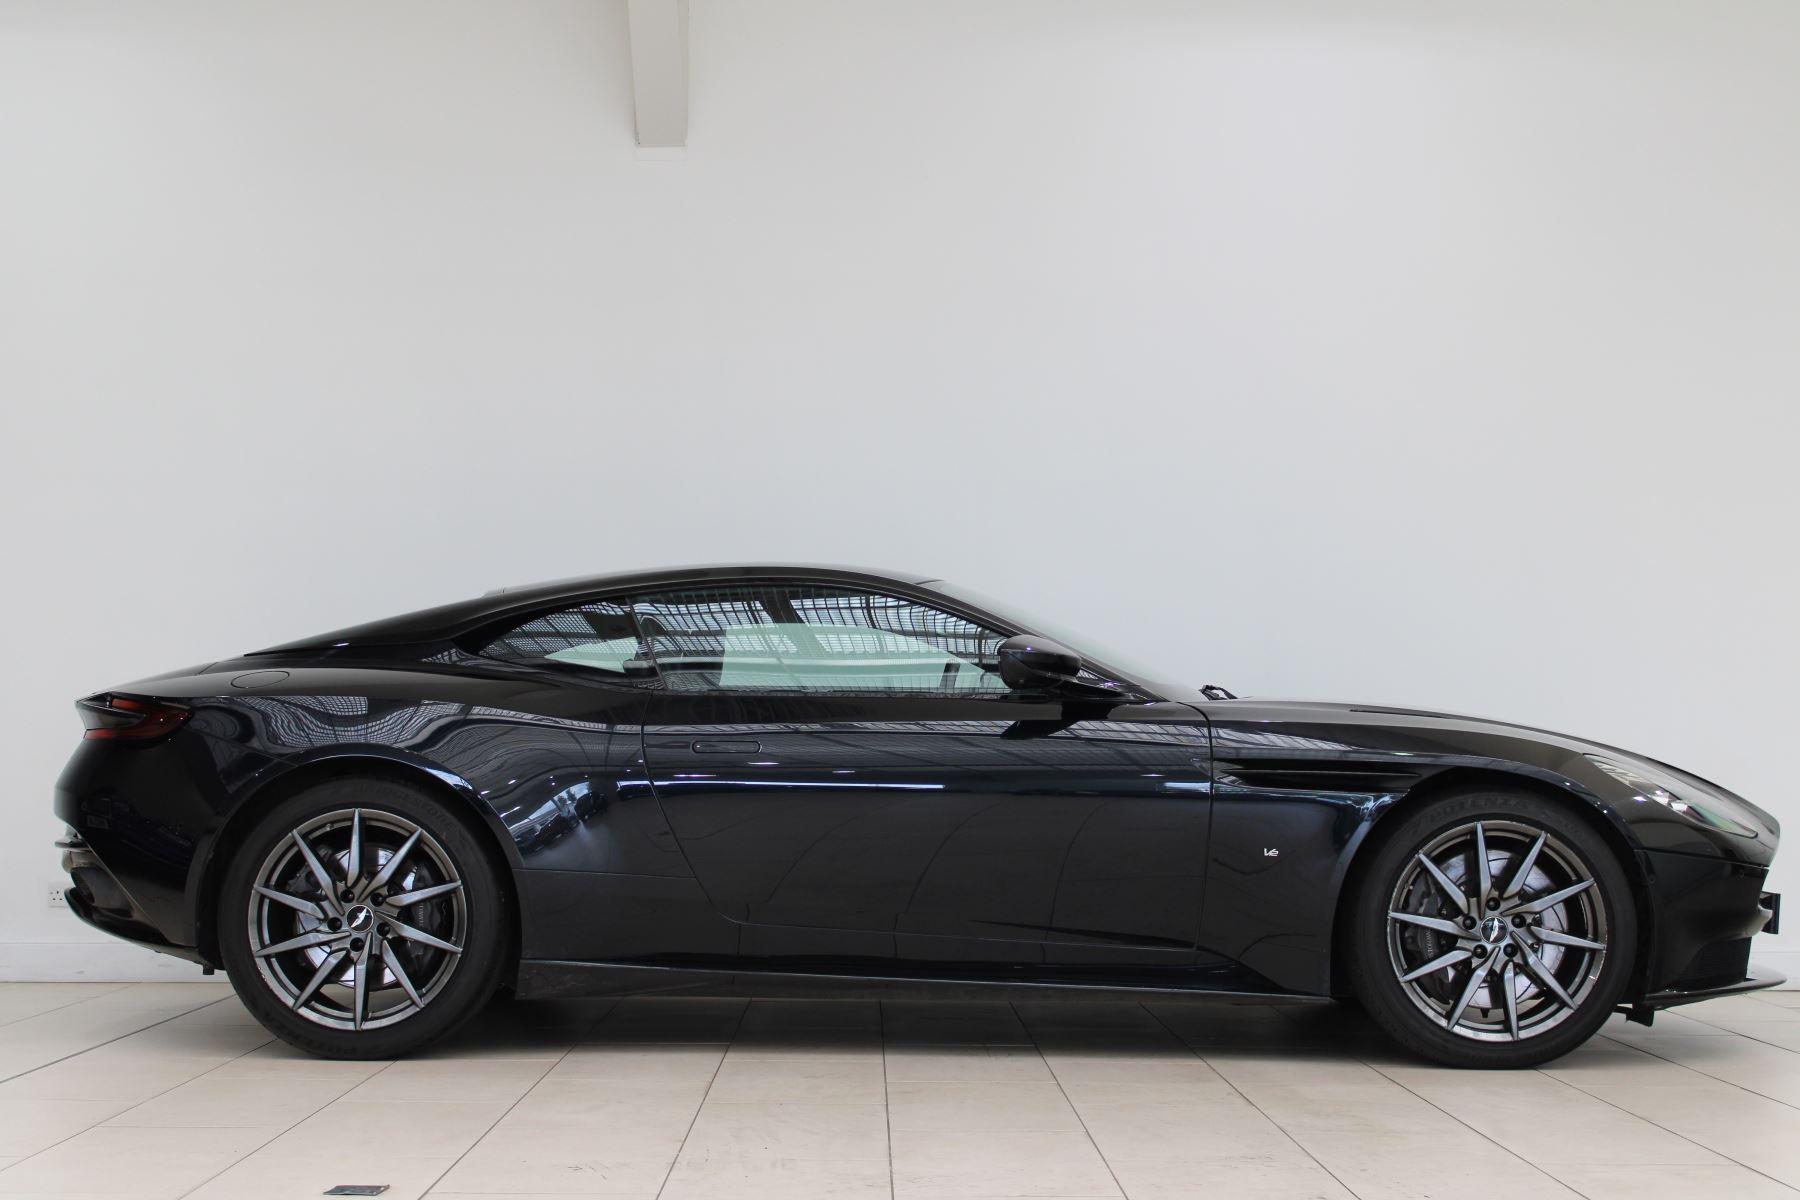 Aston Martin DB11 V12 2dr Touchtronic image 2